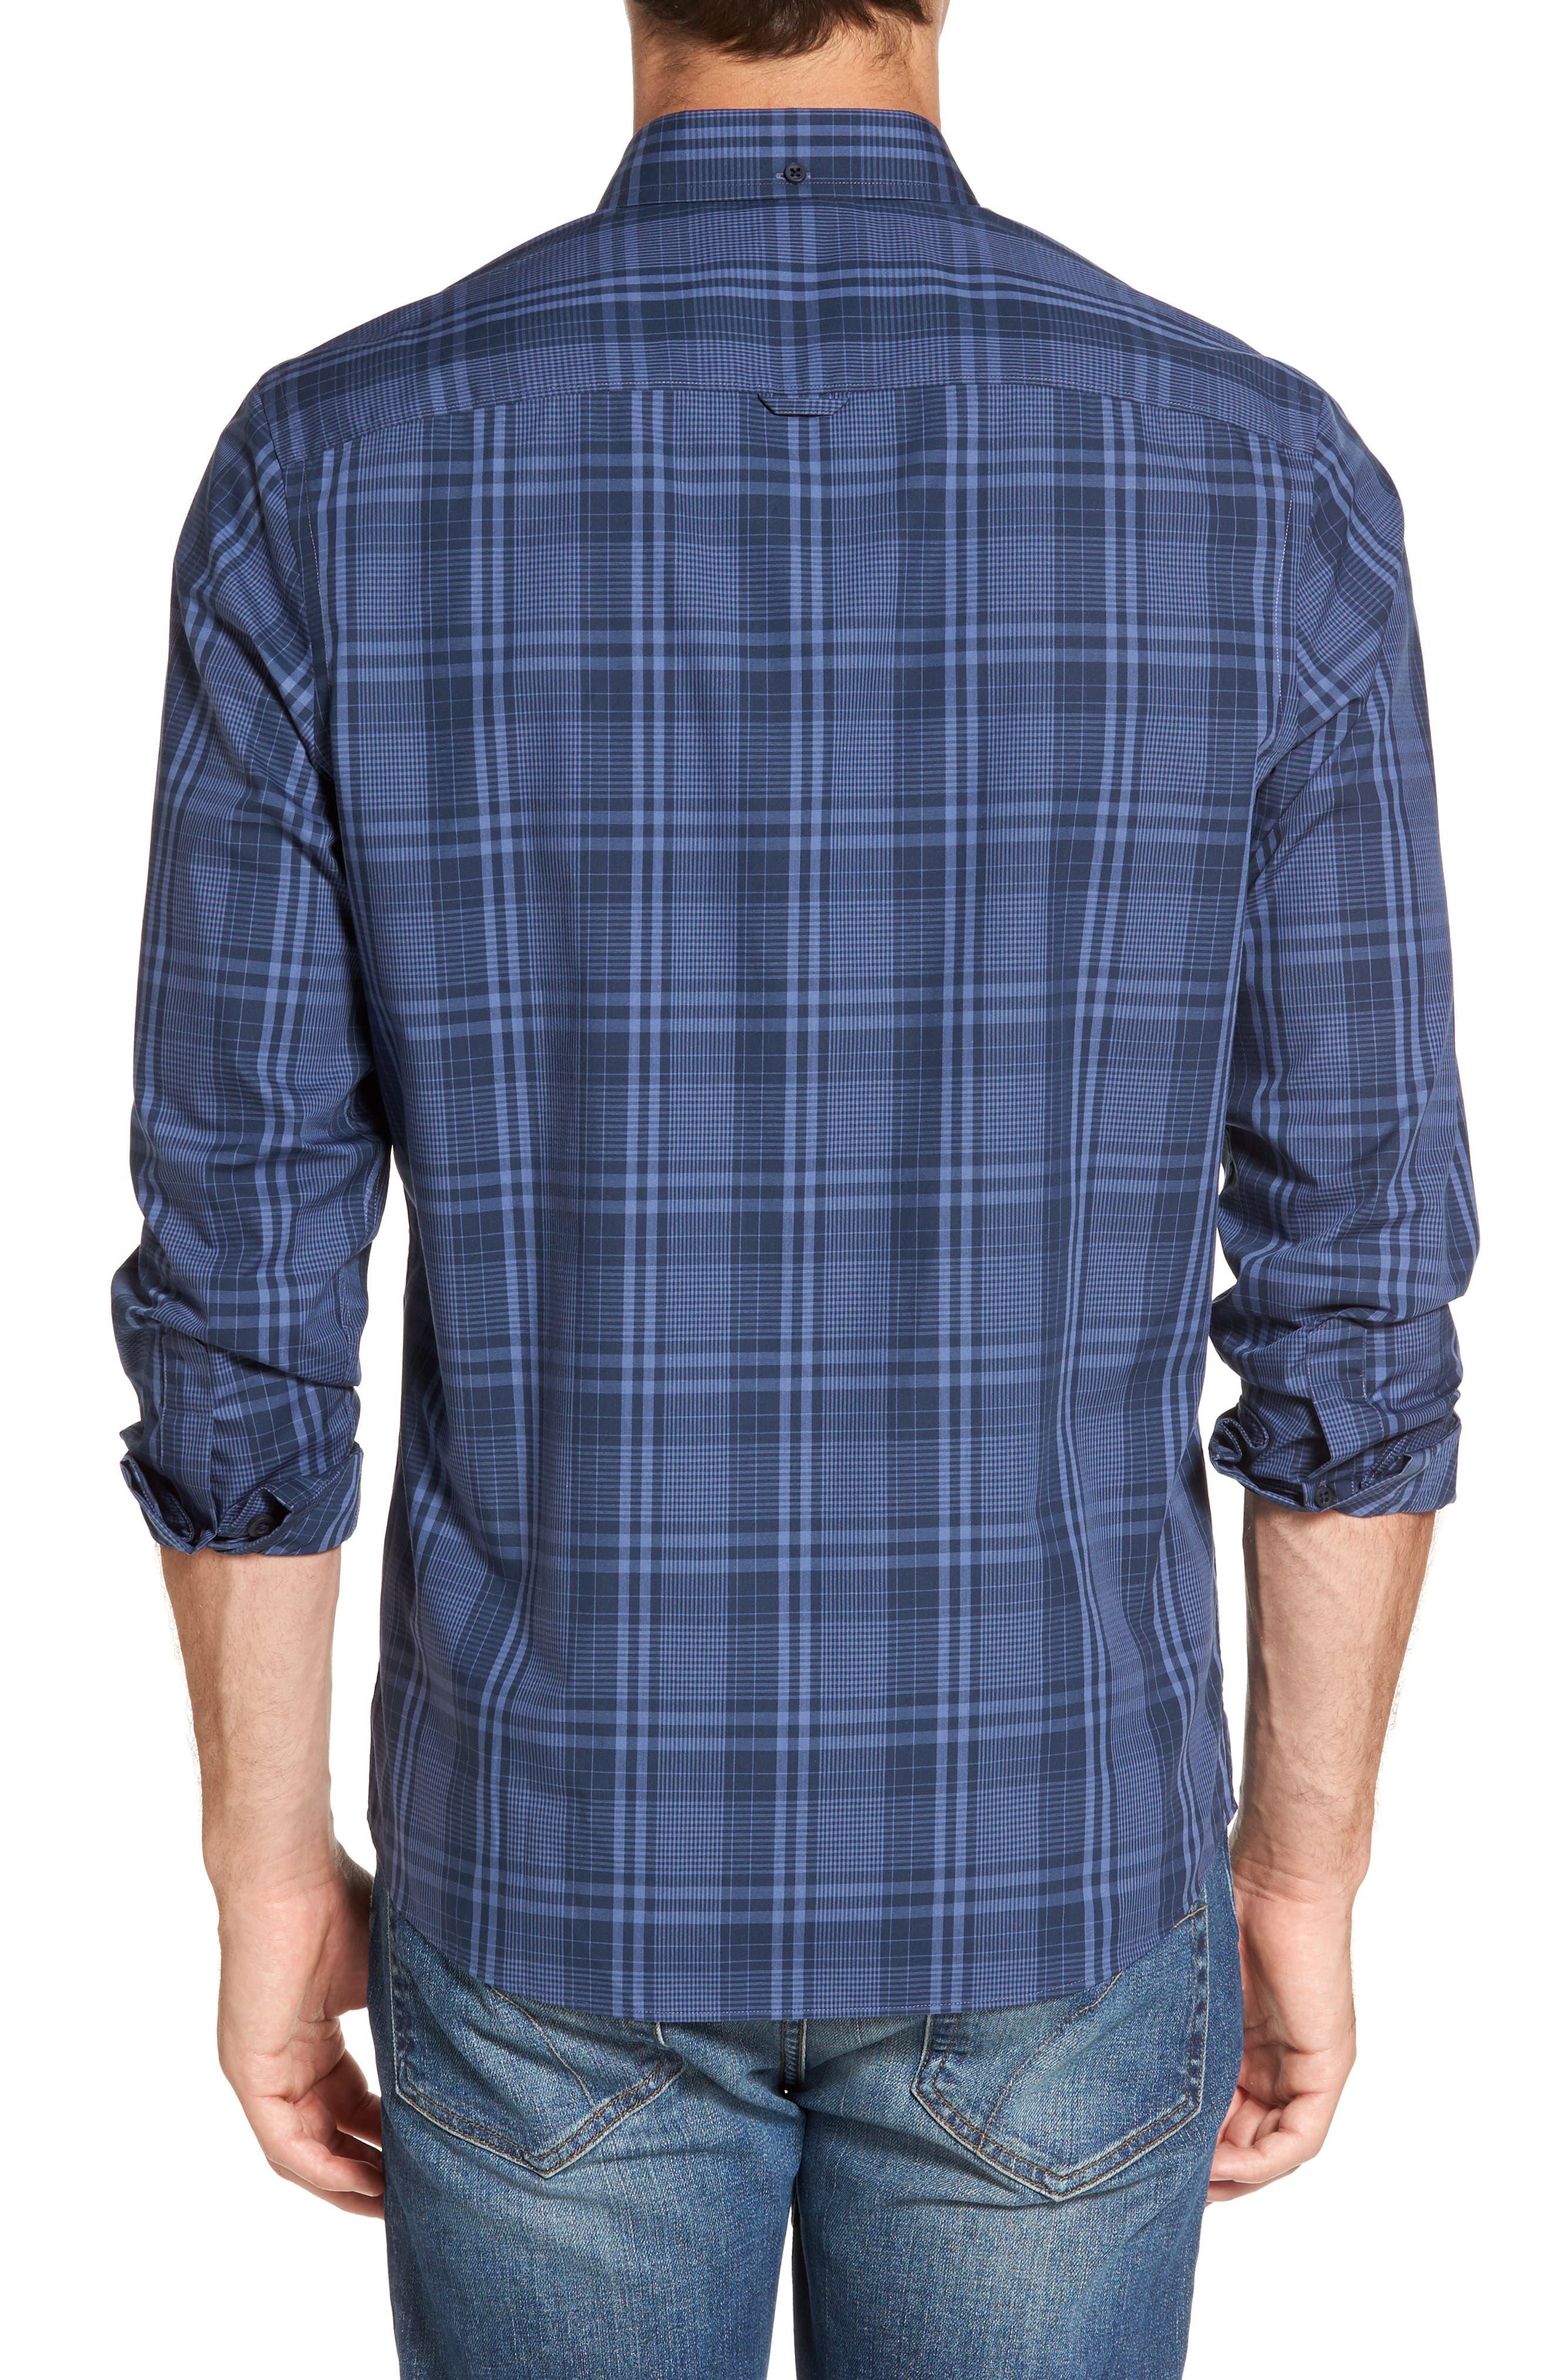 Slim Fit Plaid Sport Shirt,                             Alternate thumbnail 2, color,                             Navy Iris Blue Plaid